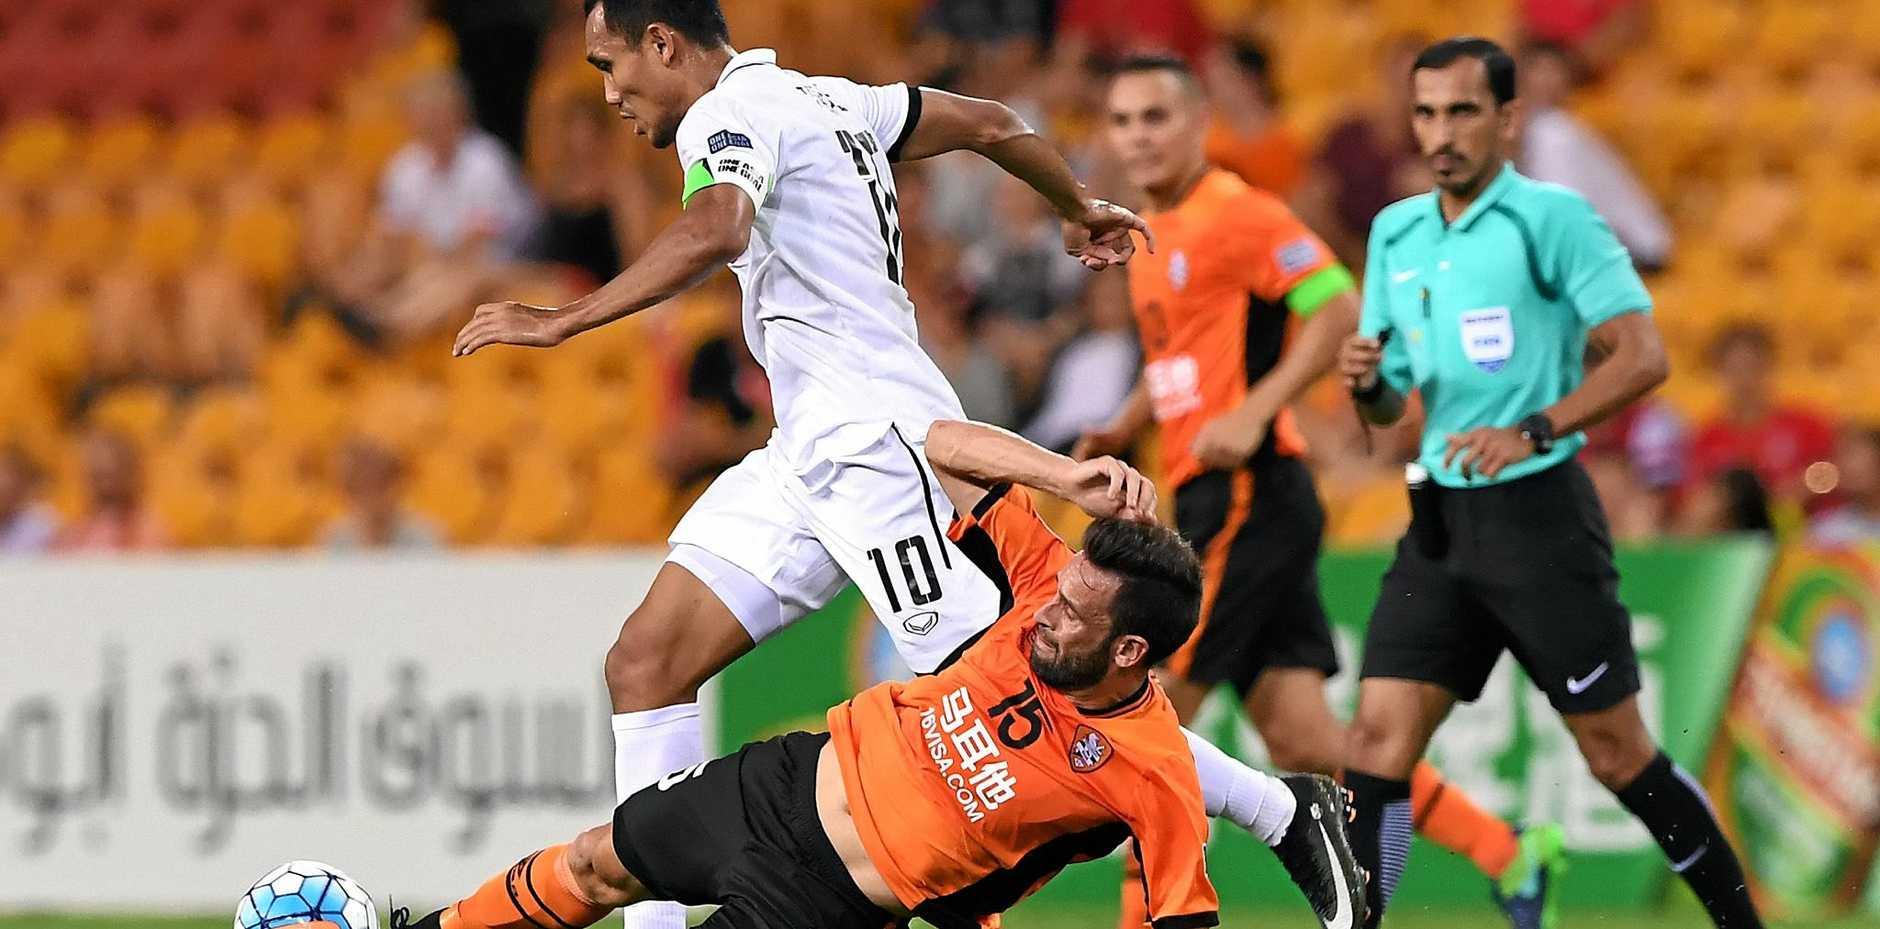 Muangthong United player Teerasil Dangda (left) competes with Roar player Manuel Arana  at Suncorp Stadium in Brisbane